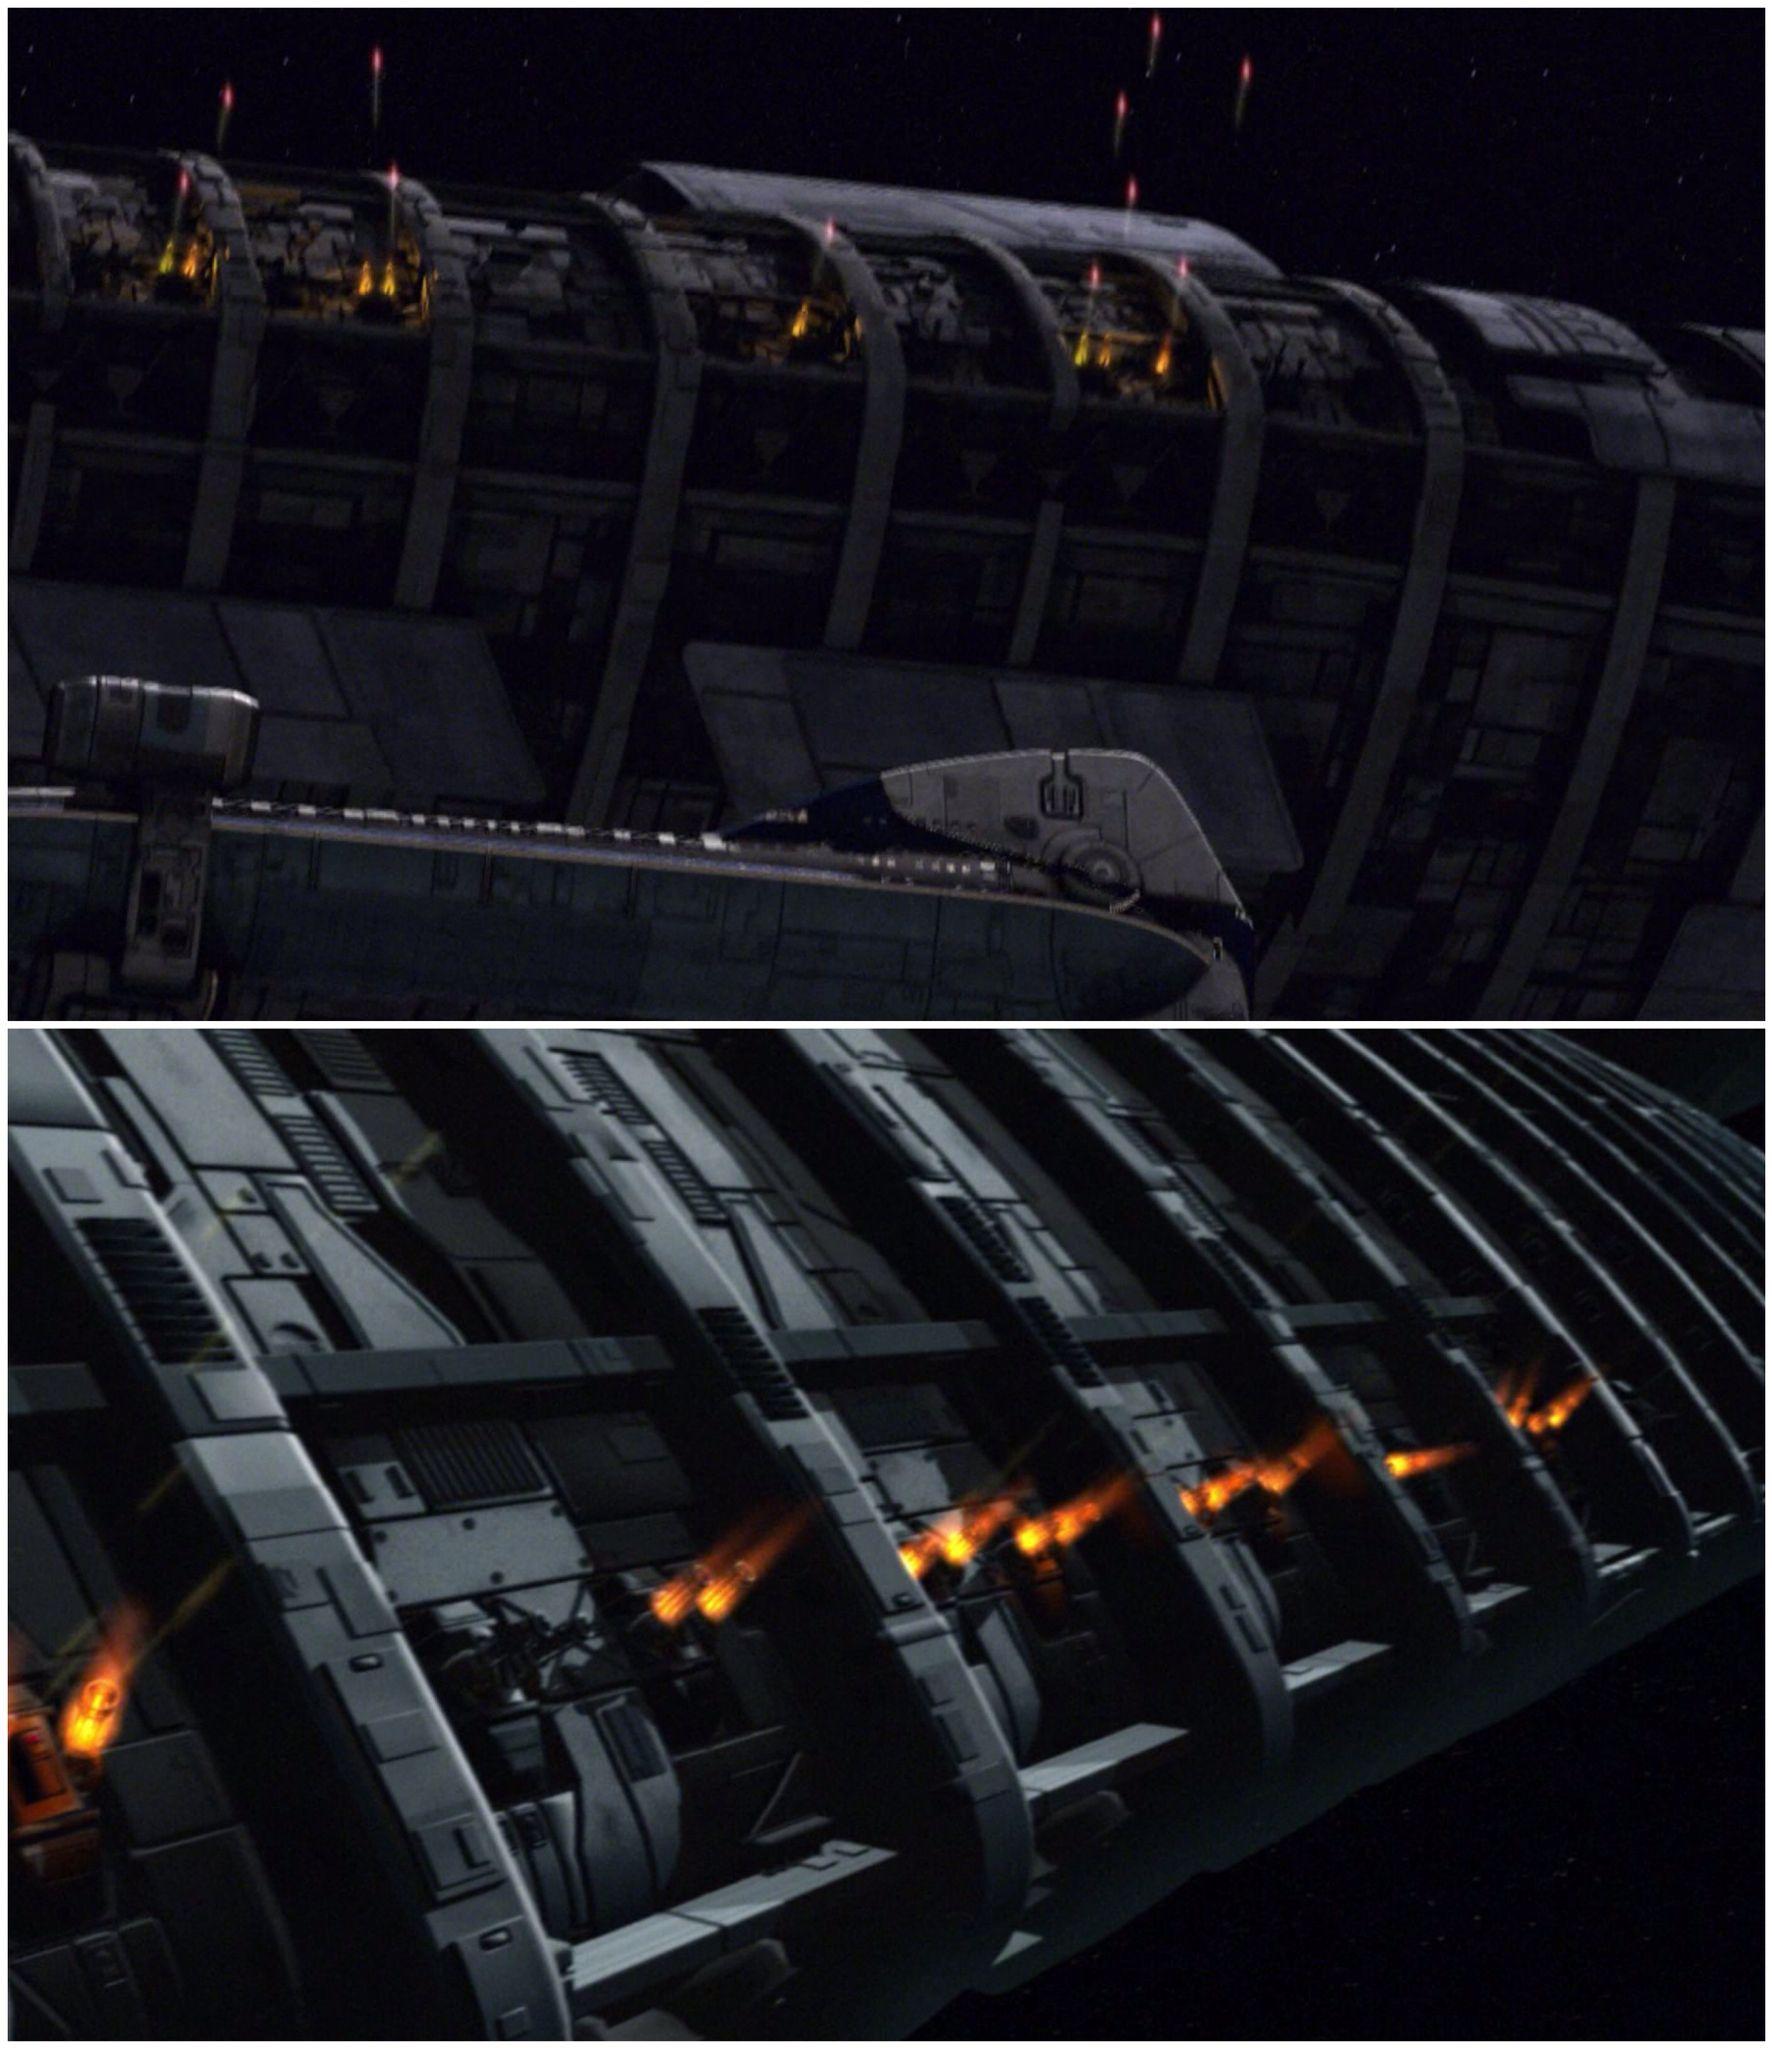 Colonial Movers Battlestar Galactica Spacecraft Kiln Dry ...  |Battlestar Galactica Spacecraft